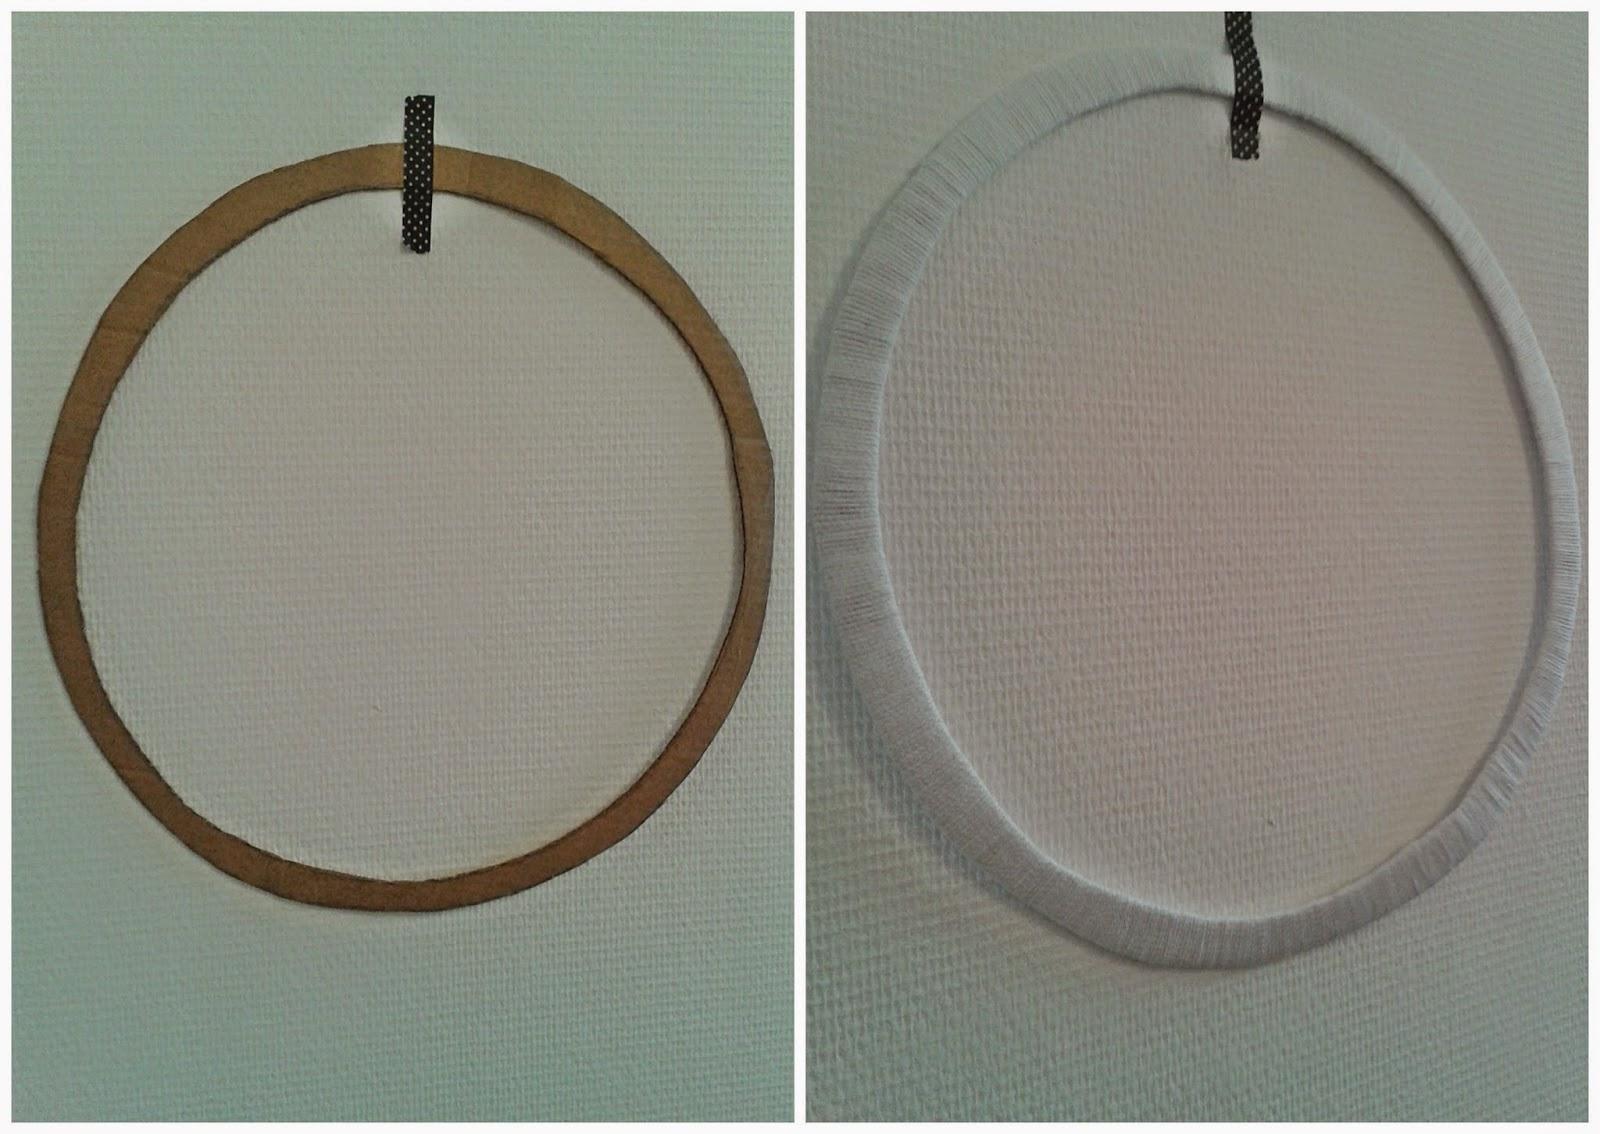 boucle d 39 aure diy attrape r ves g ant. Black Bedroom Furniture Sets. Home Design Ideas